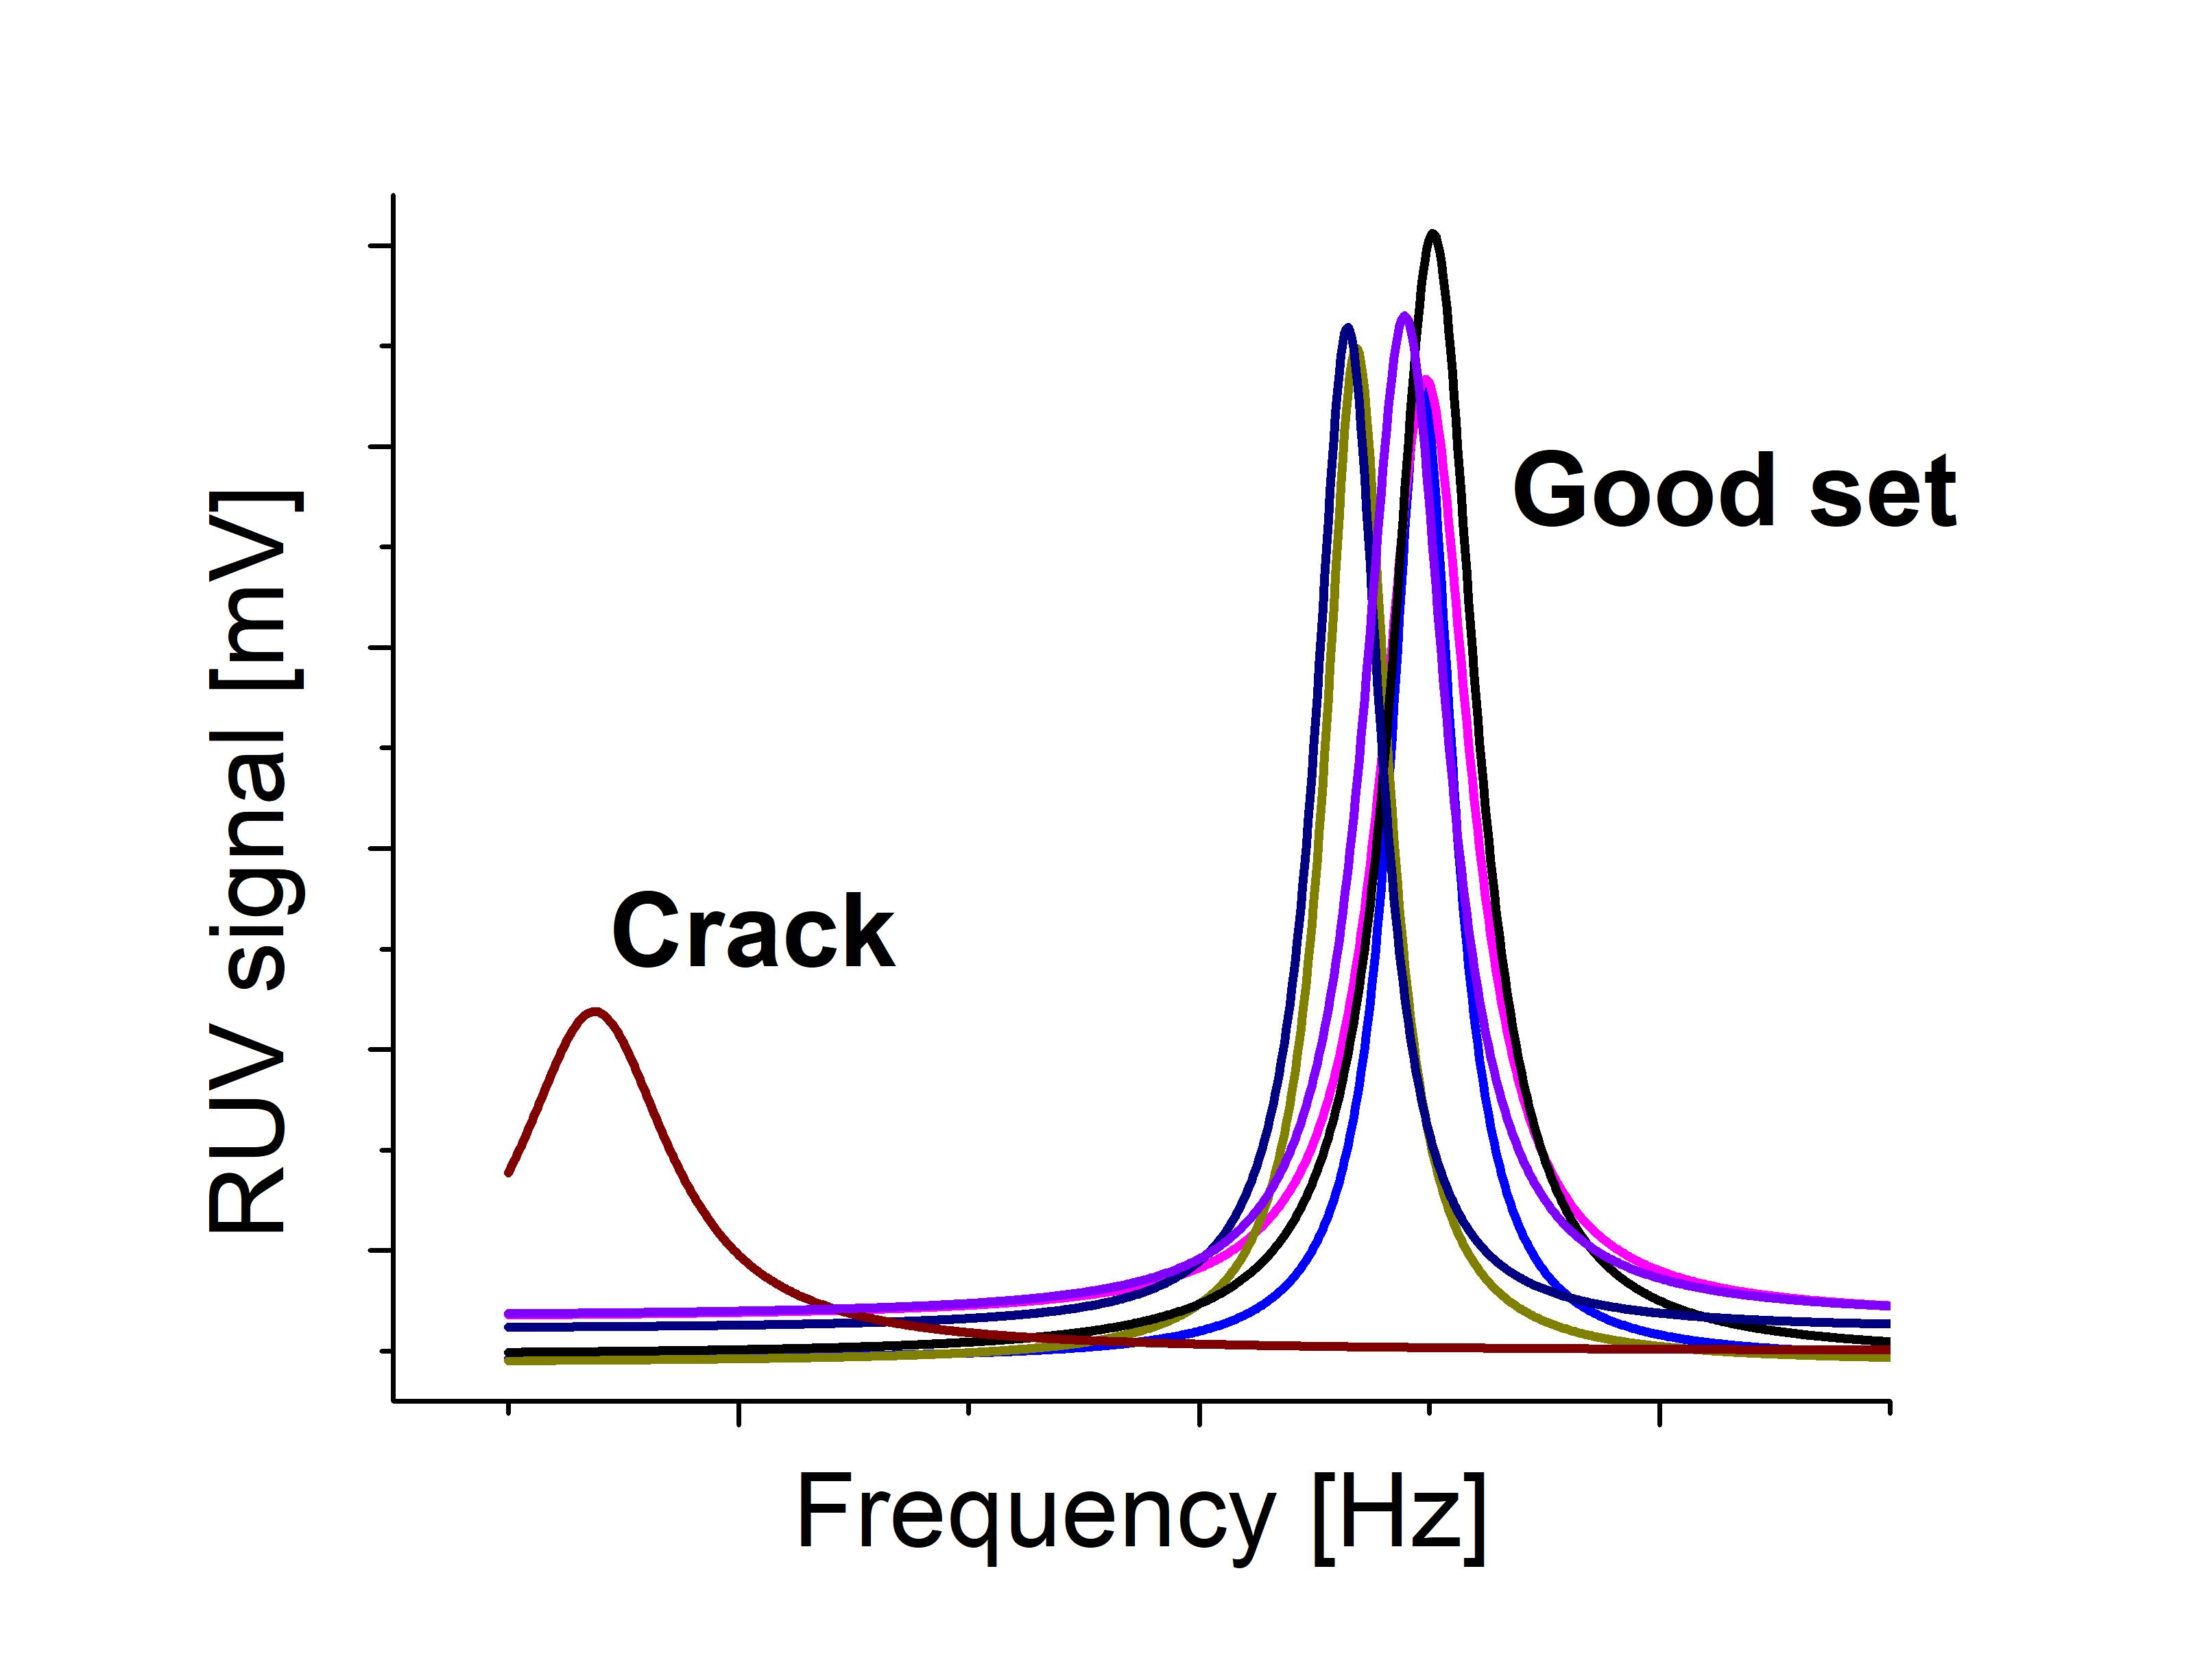 Figure 1: Deviations of RUV peak parameters caused by a crack